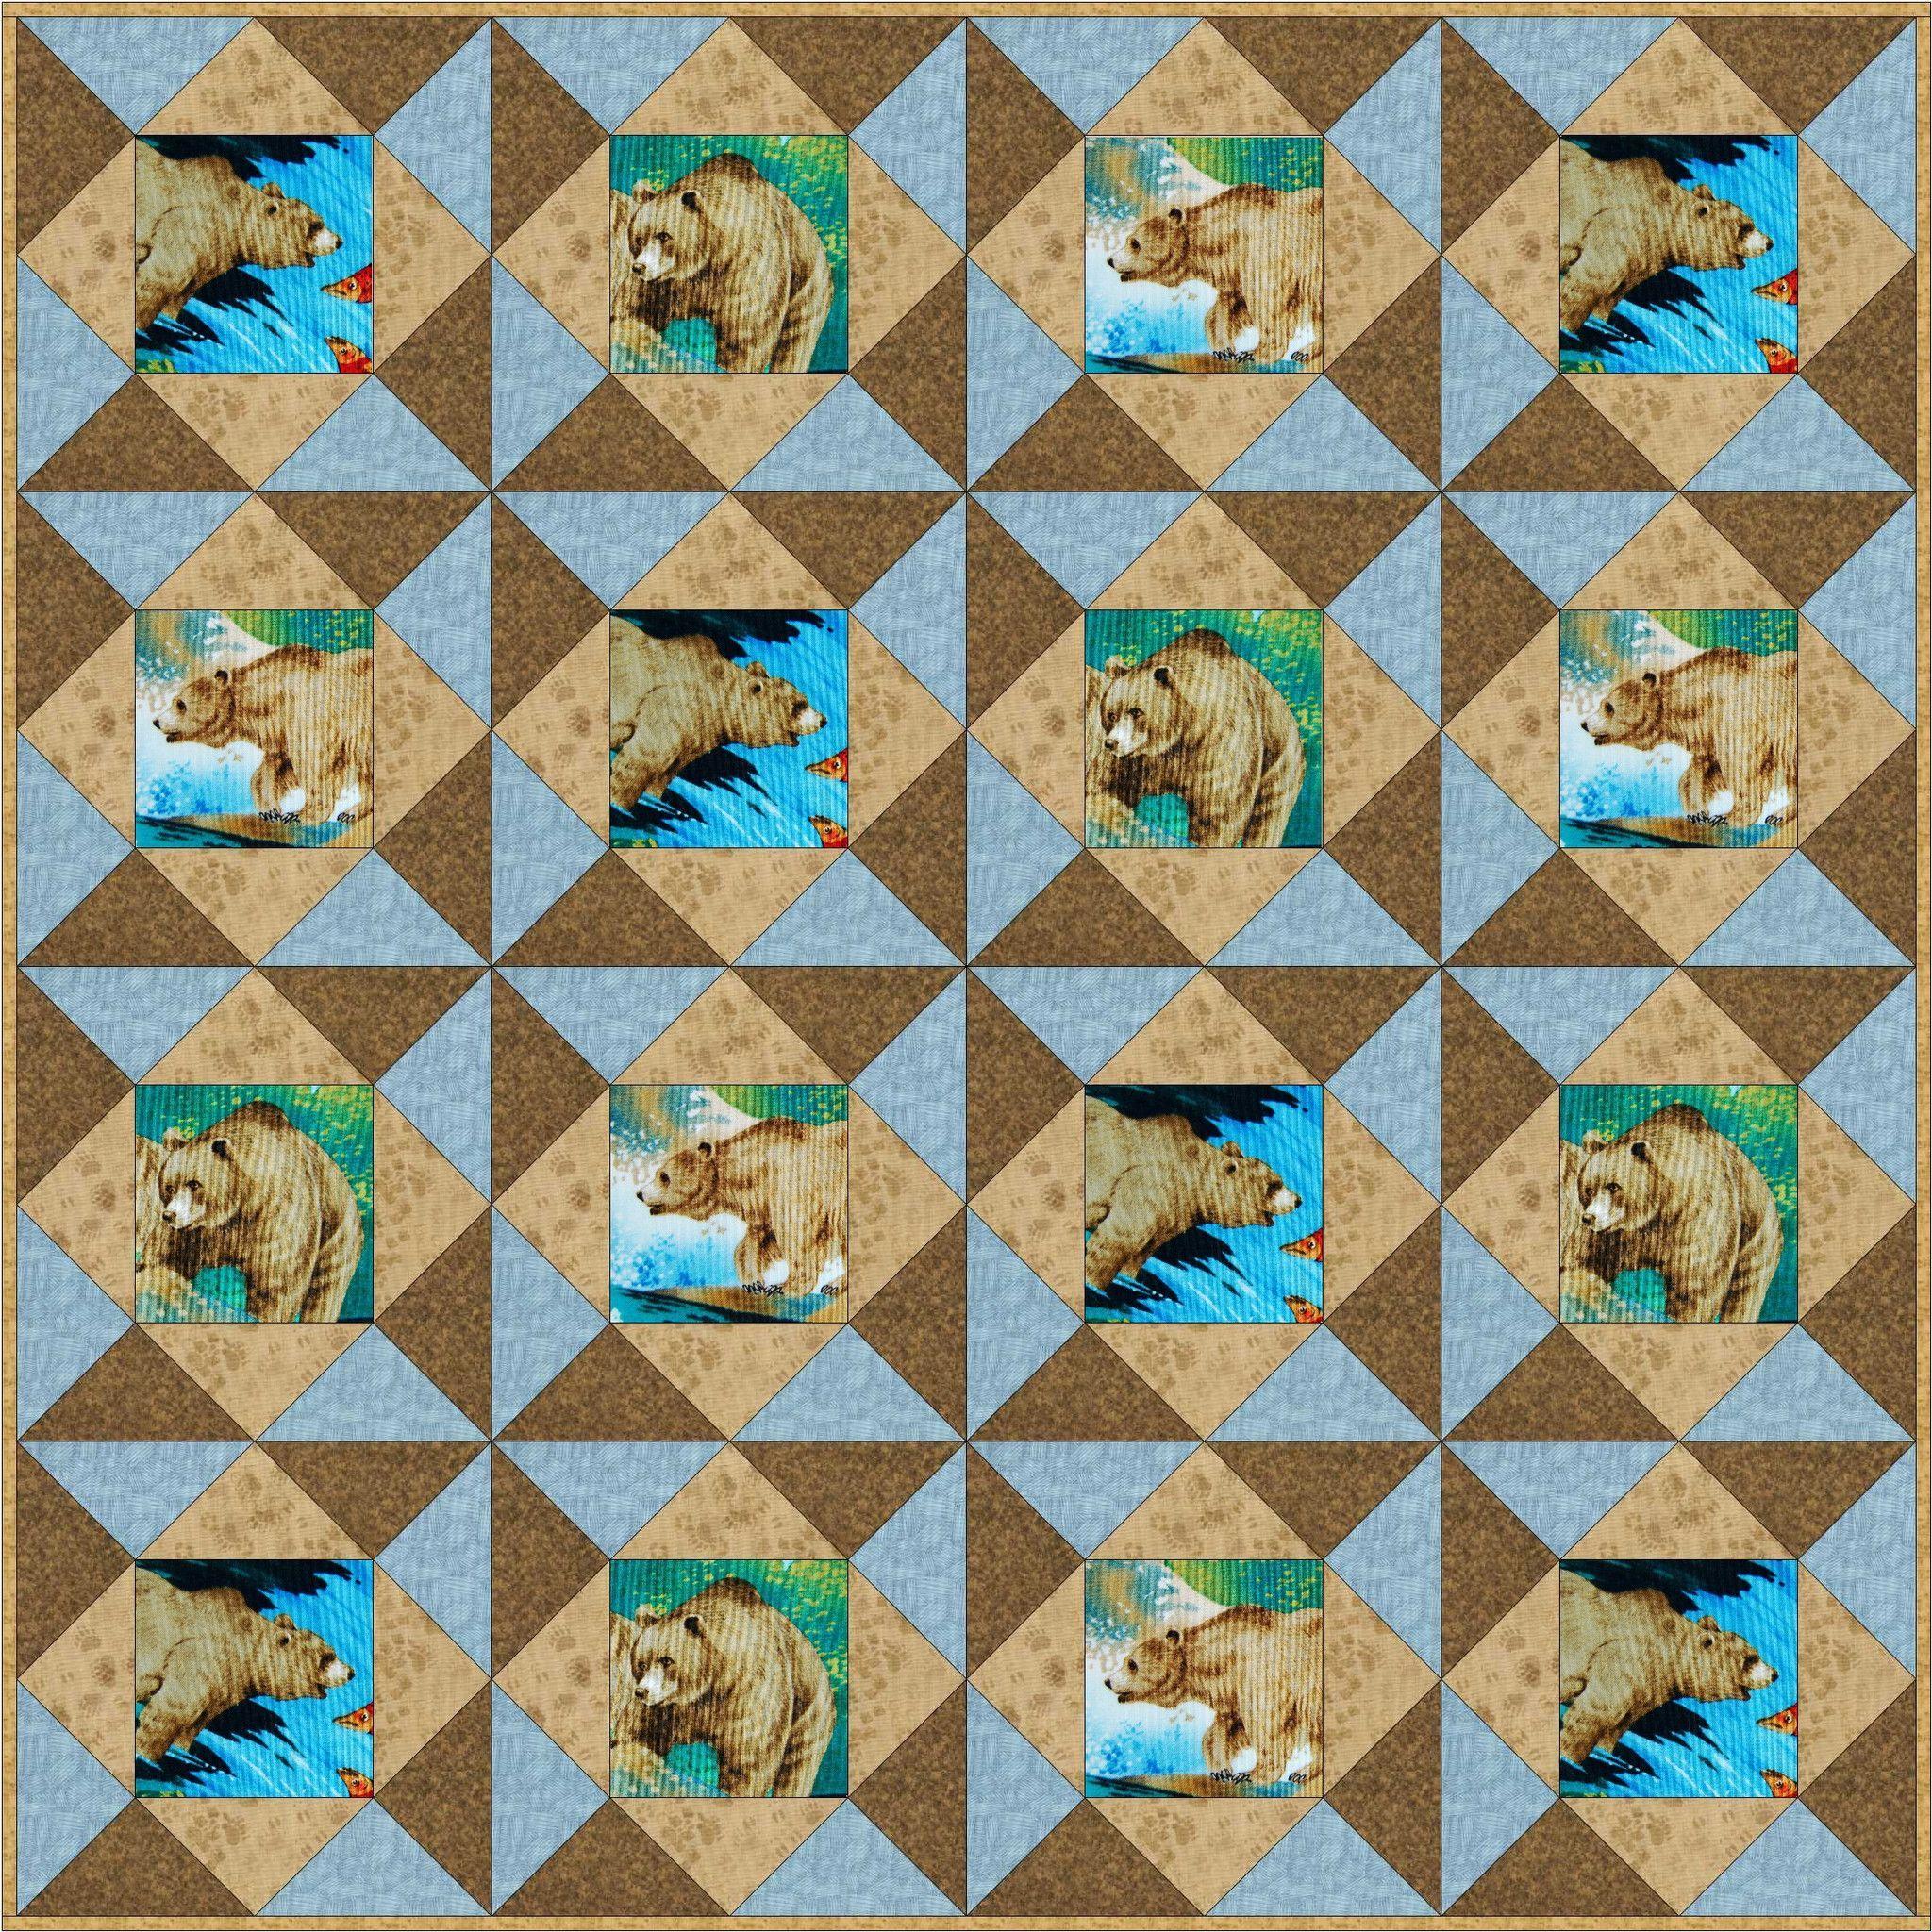 Brown Bear Paws Pre-Cut Quilt Blocks Kit from Quilt Kit Shop | Our ... : pre cut quilt kits for beginners - Adamdwight.com